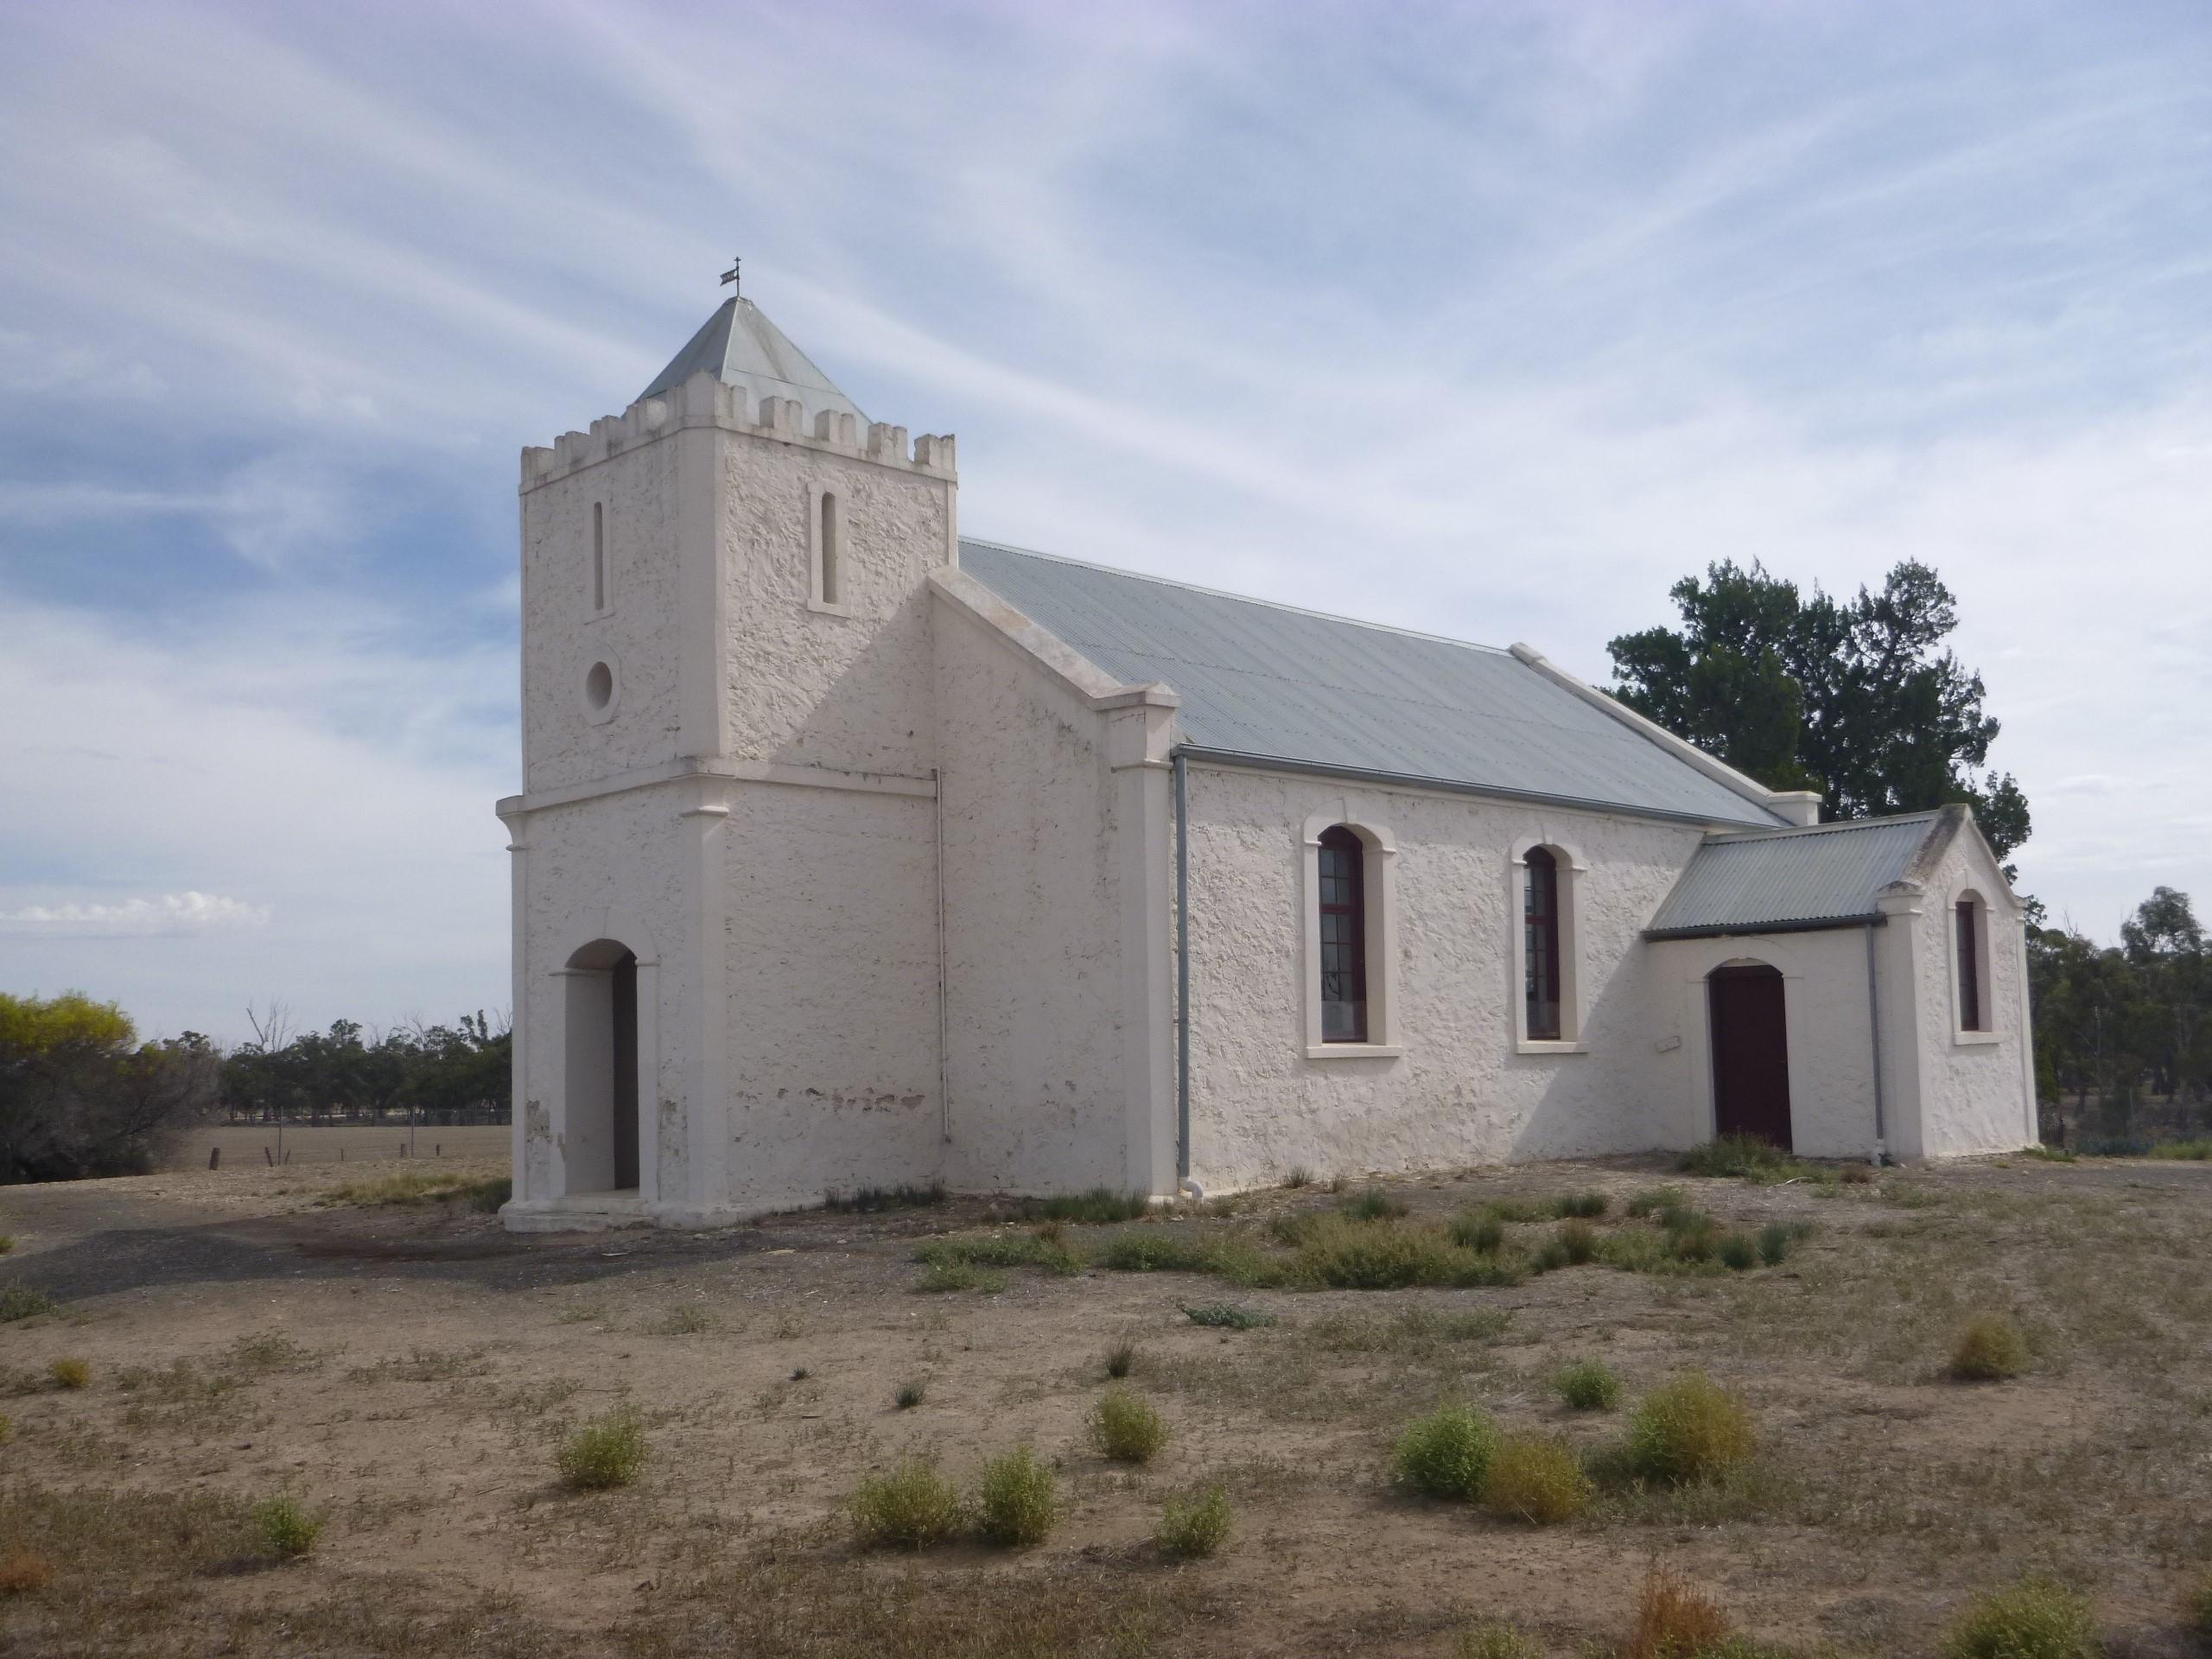 Ebenezer Mission, Wimmera, Victoria